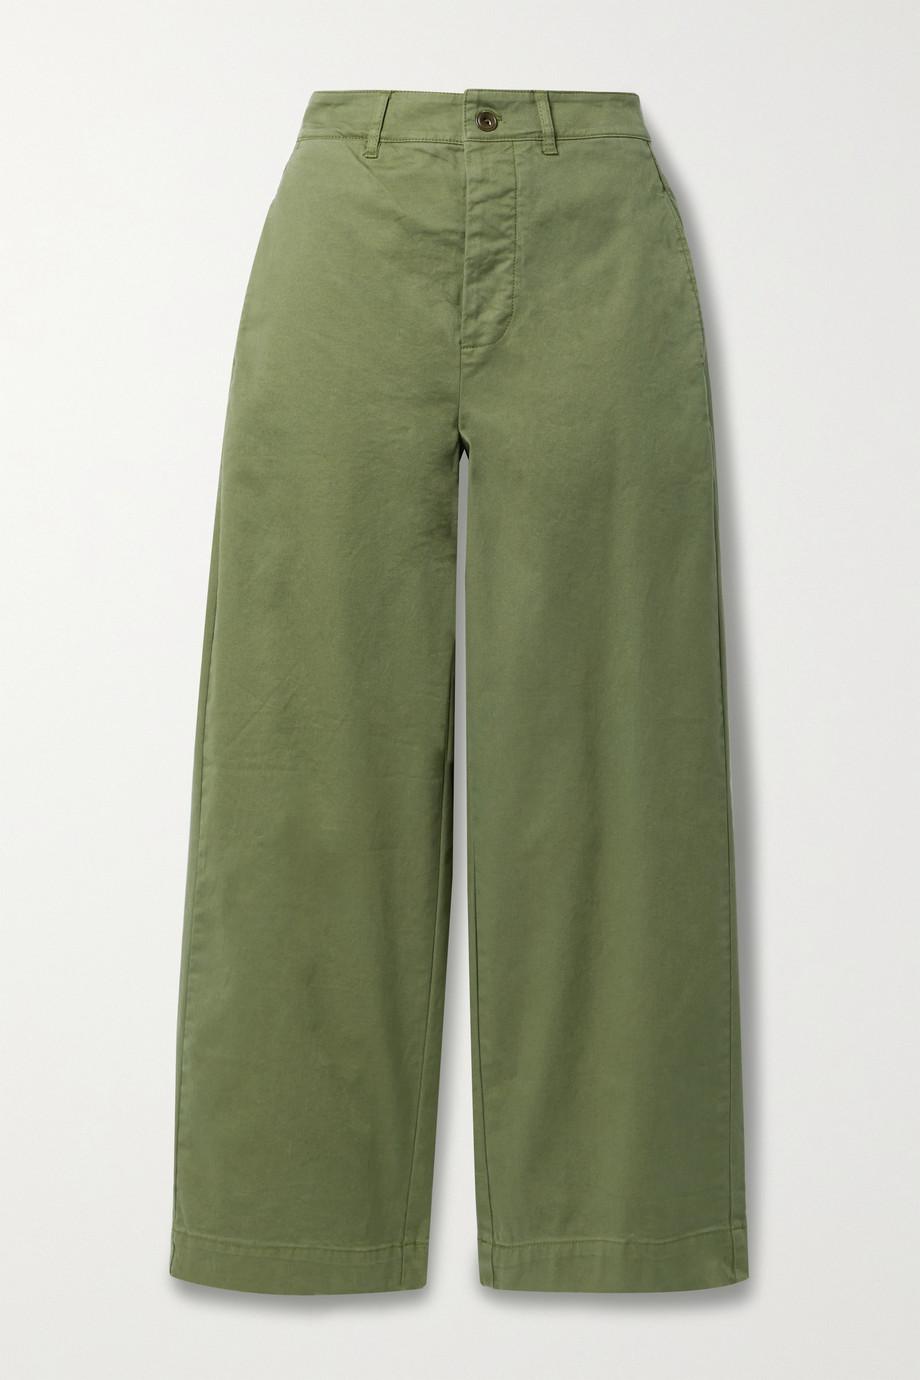 Alex Mill Gene cotton-blend twill wide-leg pants